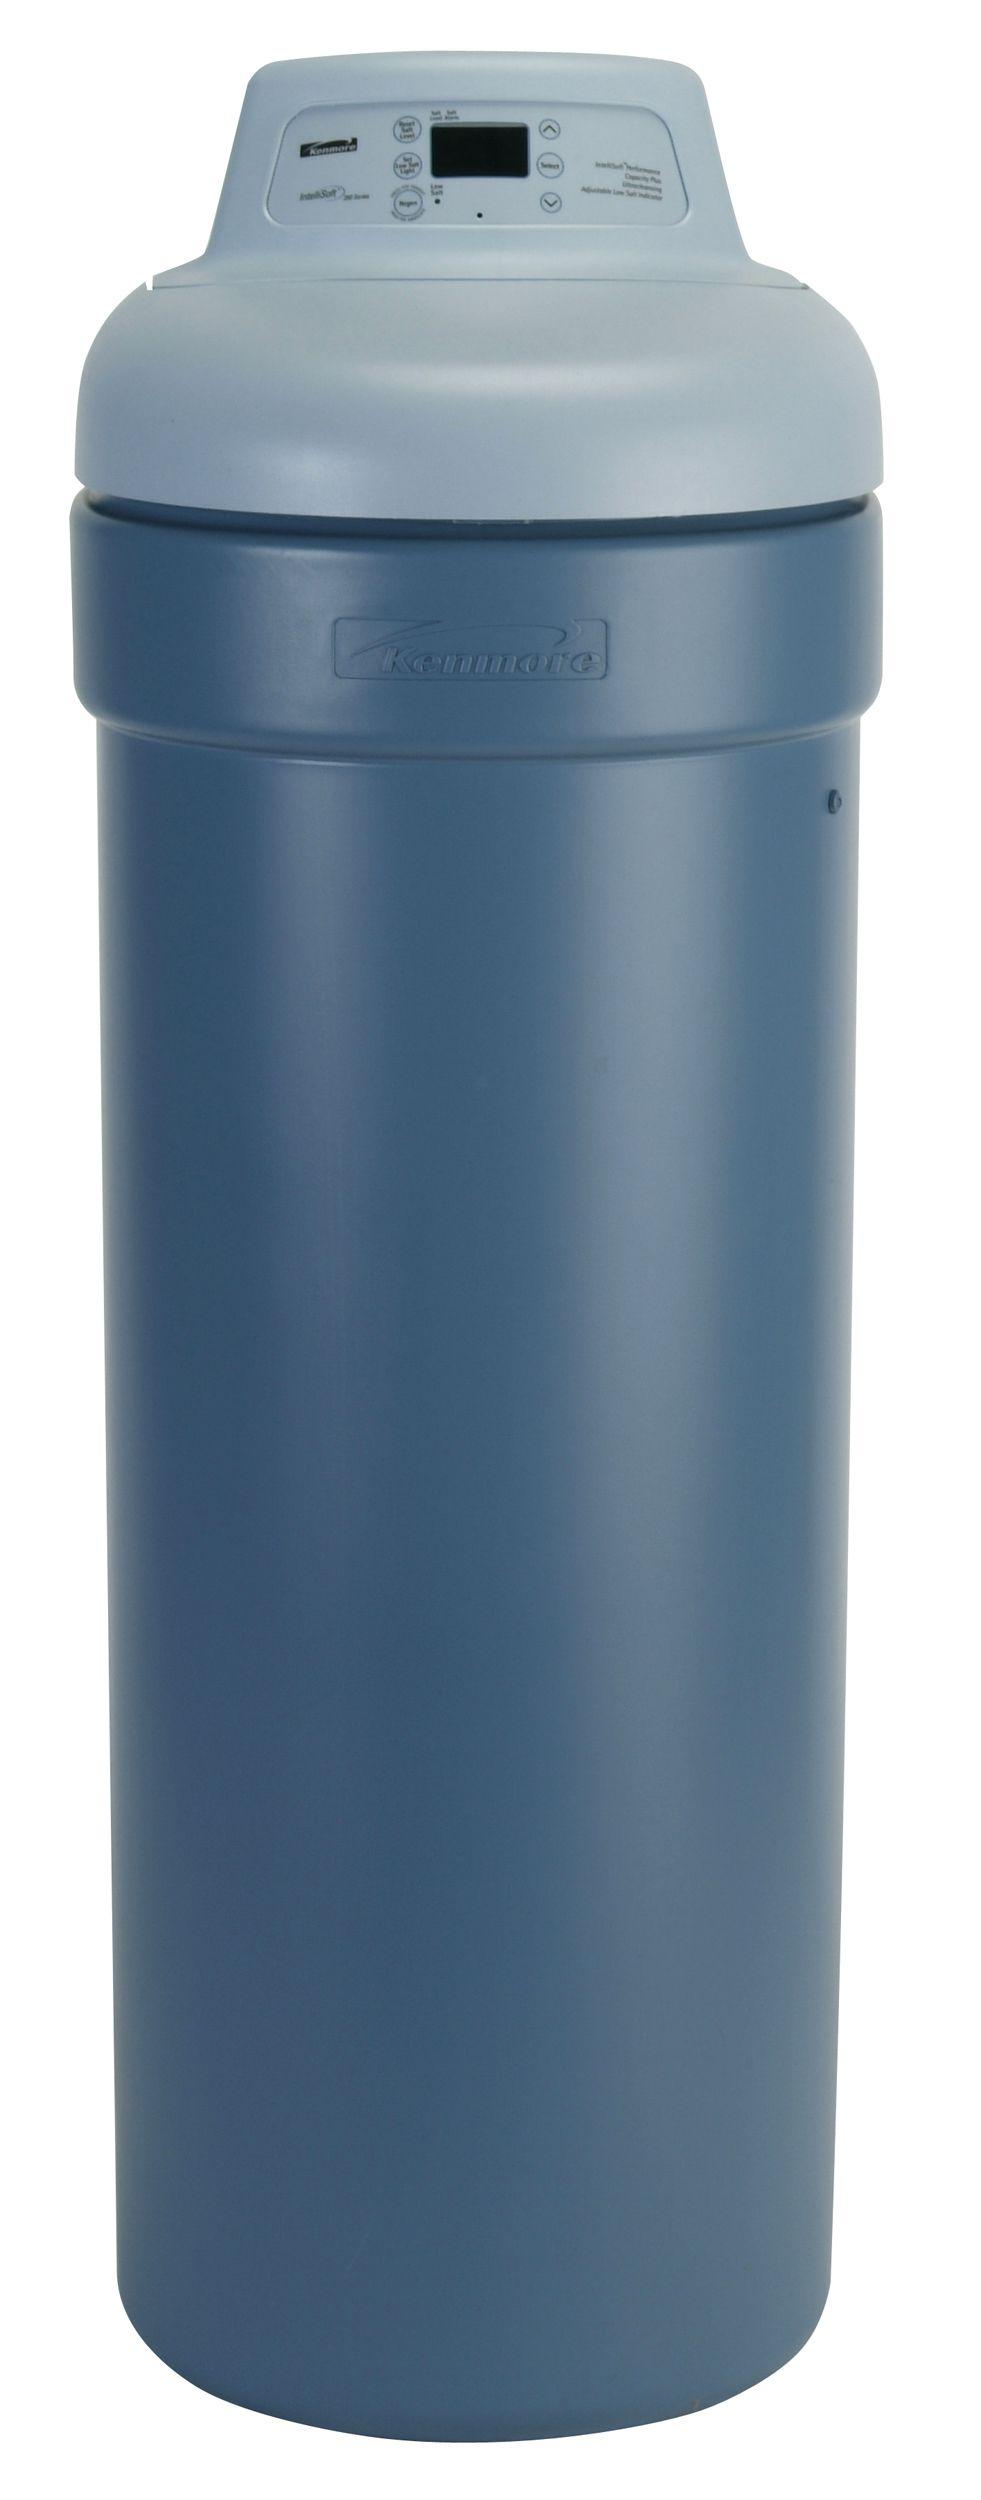 Kenmore 350 Series Water Softener  Appliances  Water